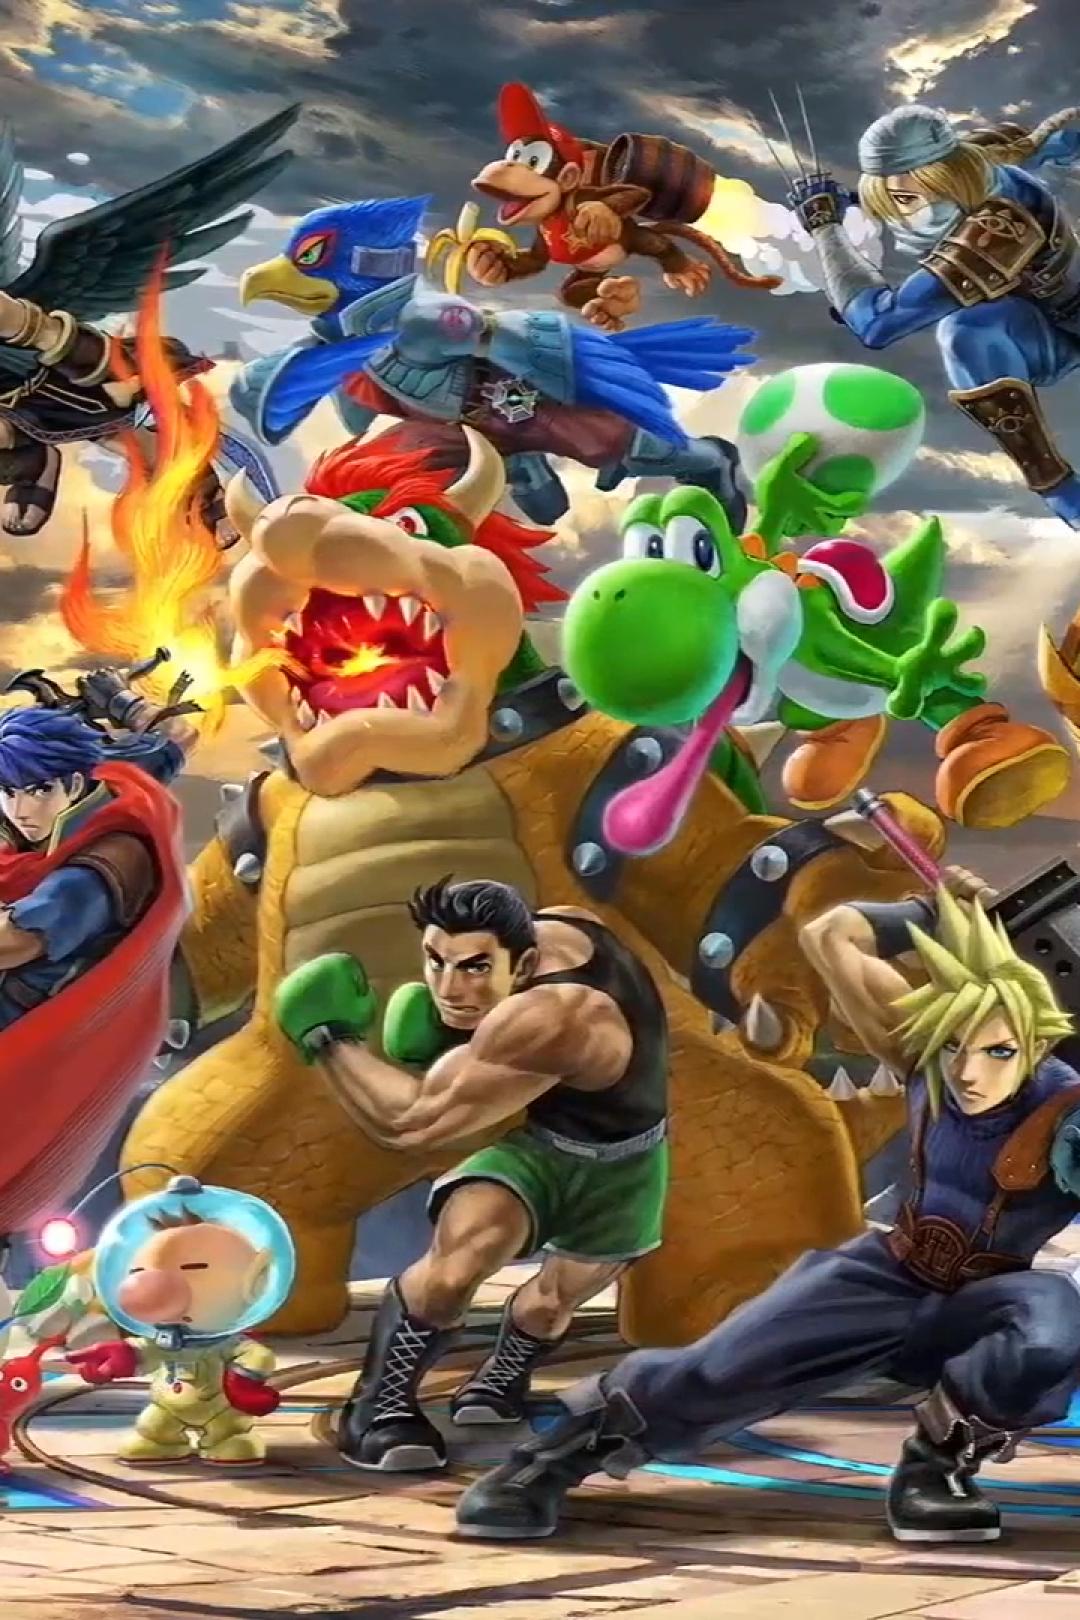 1080x1620 Super Smash Bros Ultimate 1080x1620 Resolution ...